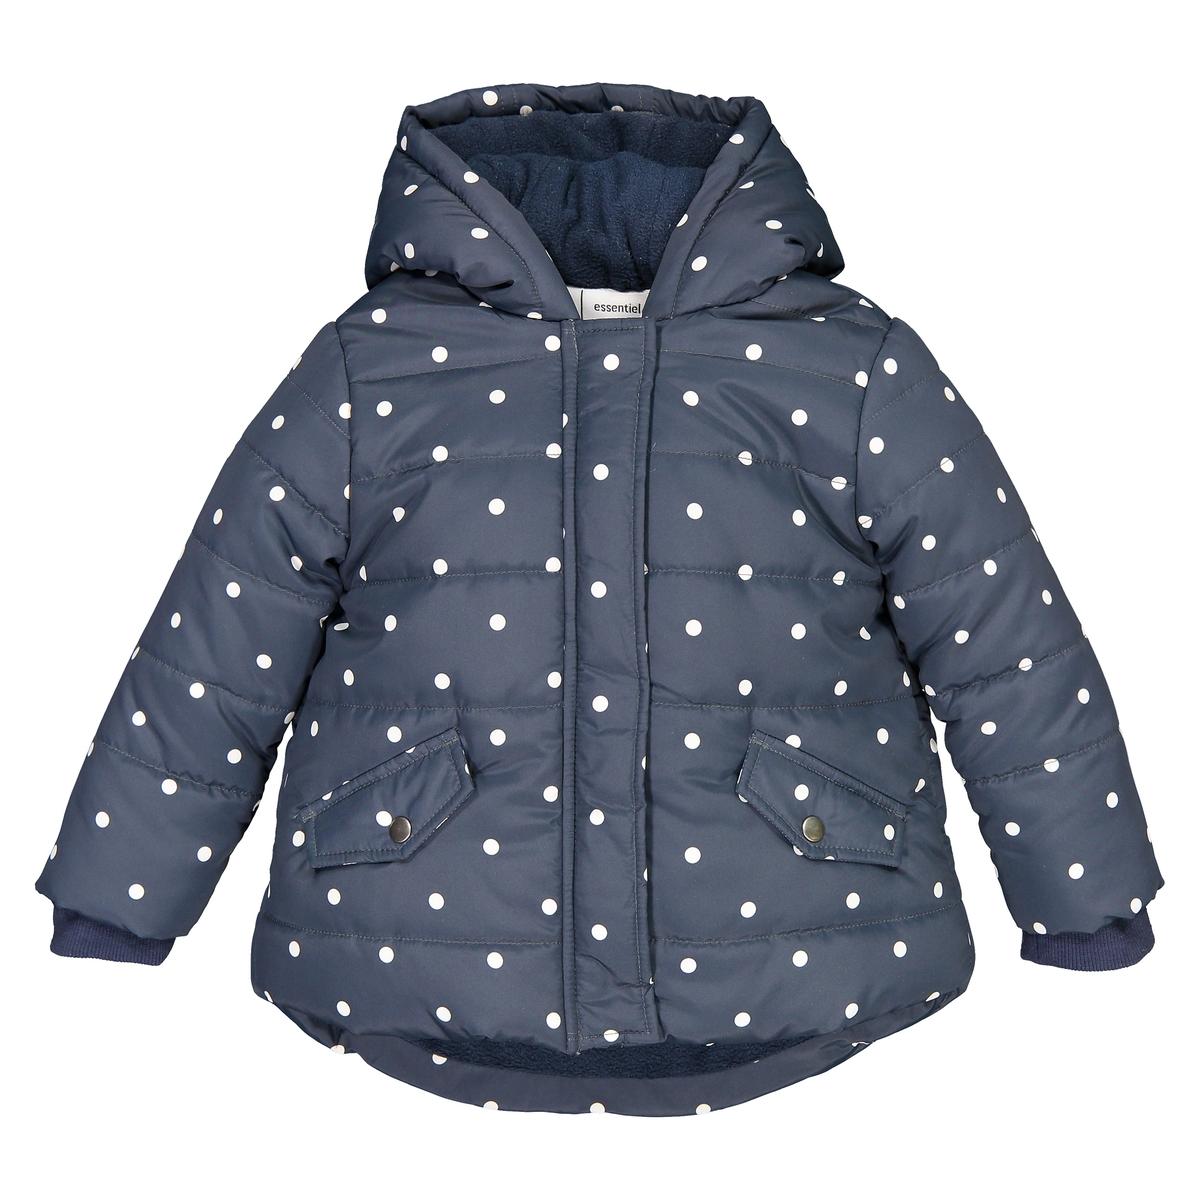 Куртка La Redoute В горошек на подкладке из флиса мес - года 1 год - 74 см синий куртка la redoute в горошек на подкладке из флиса мес года 1 мес 54 см синий